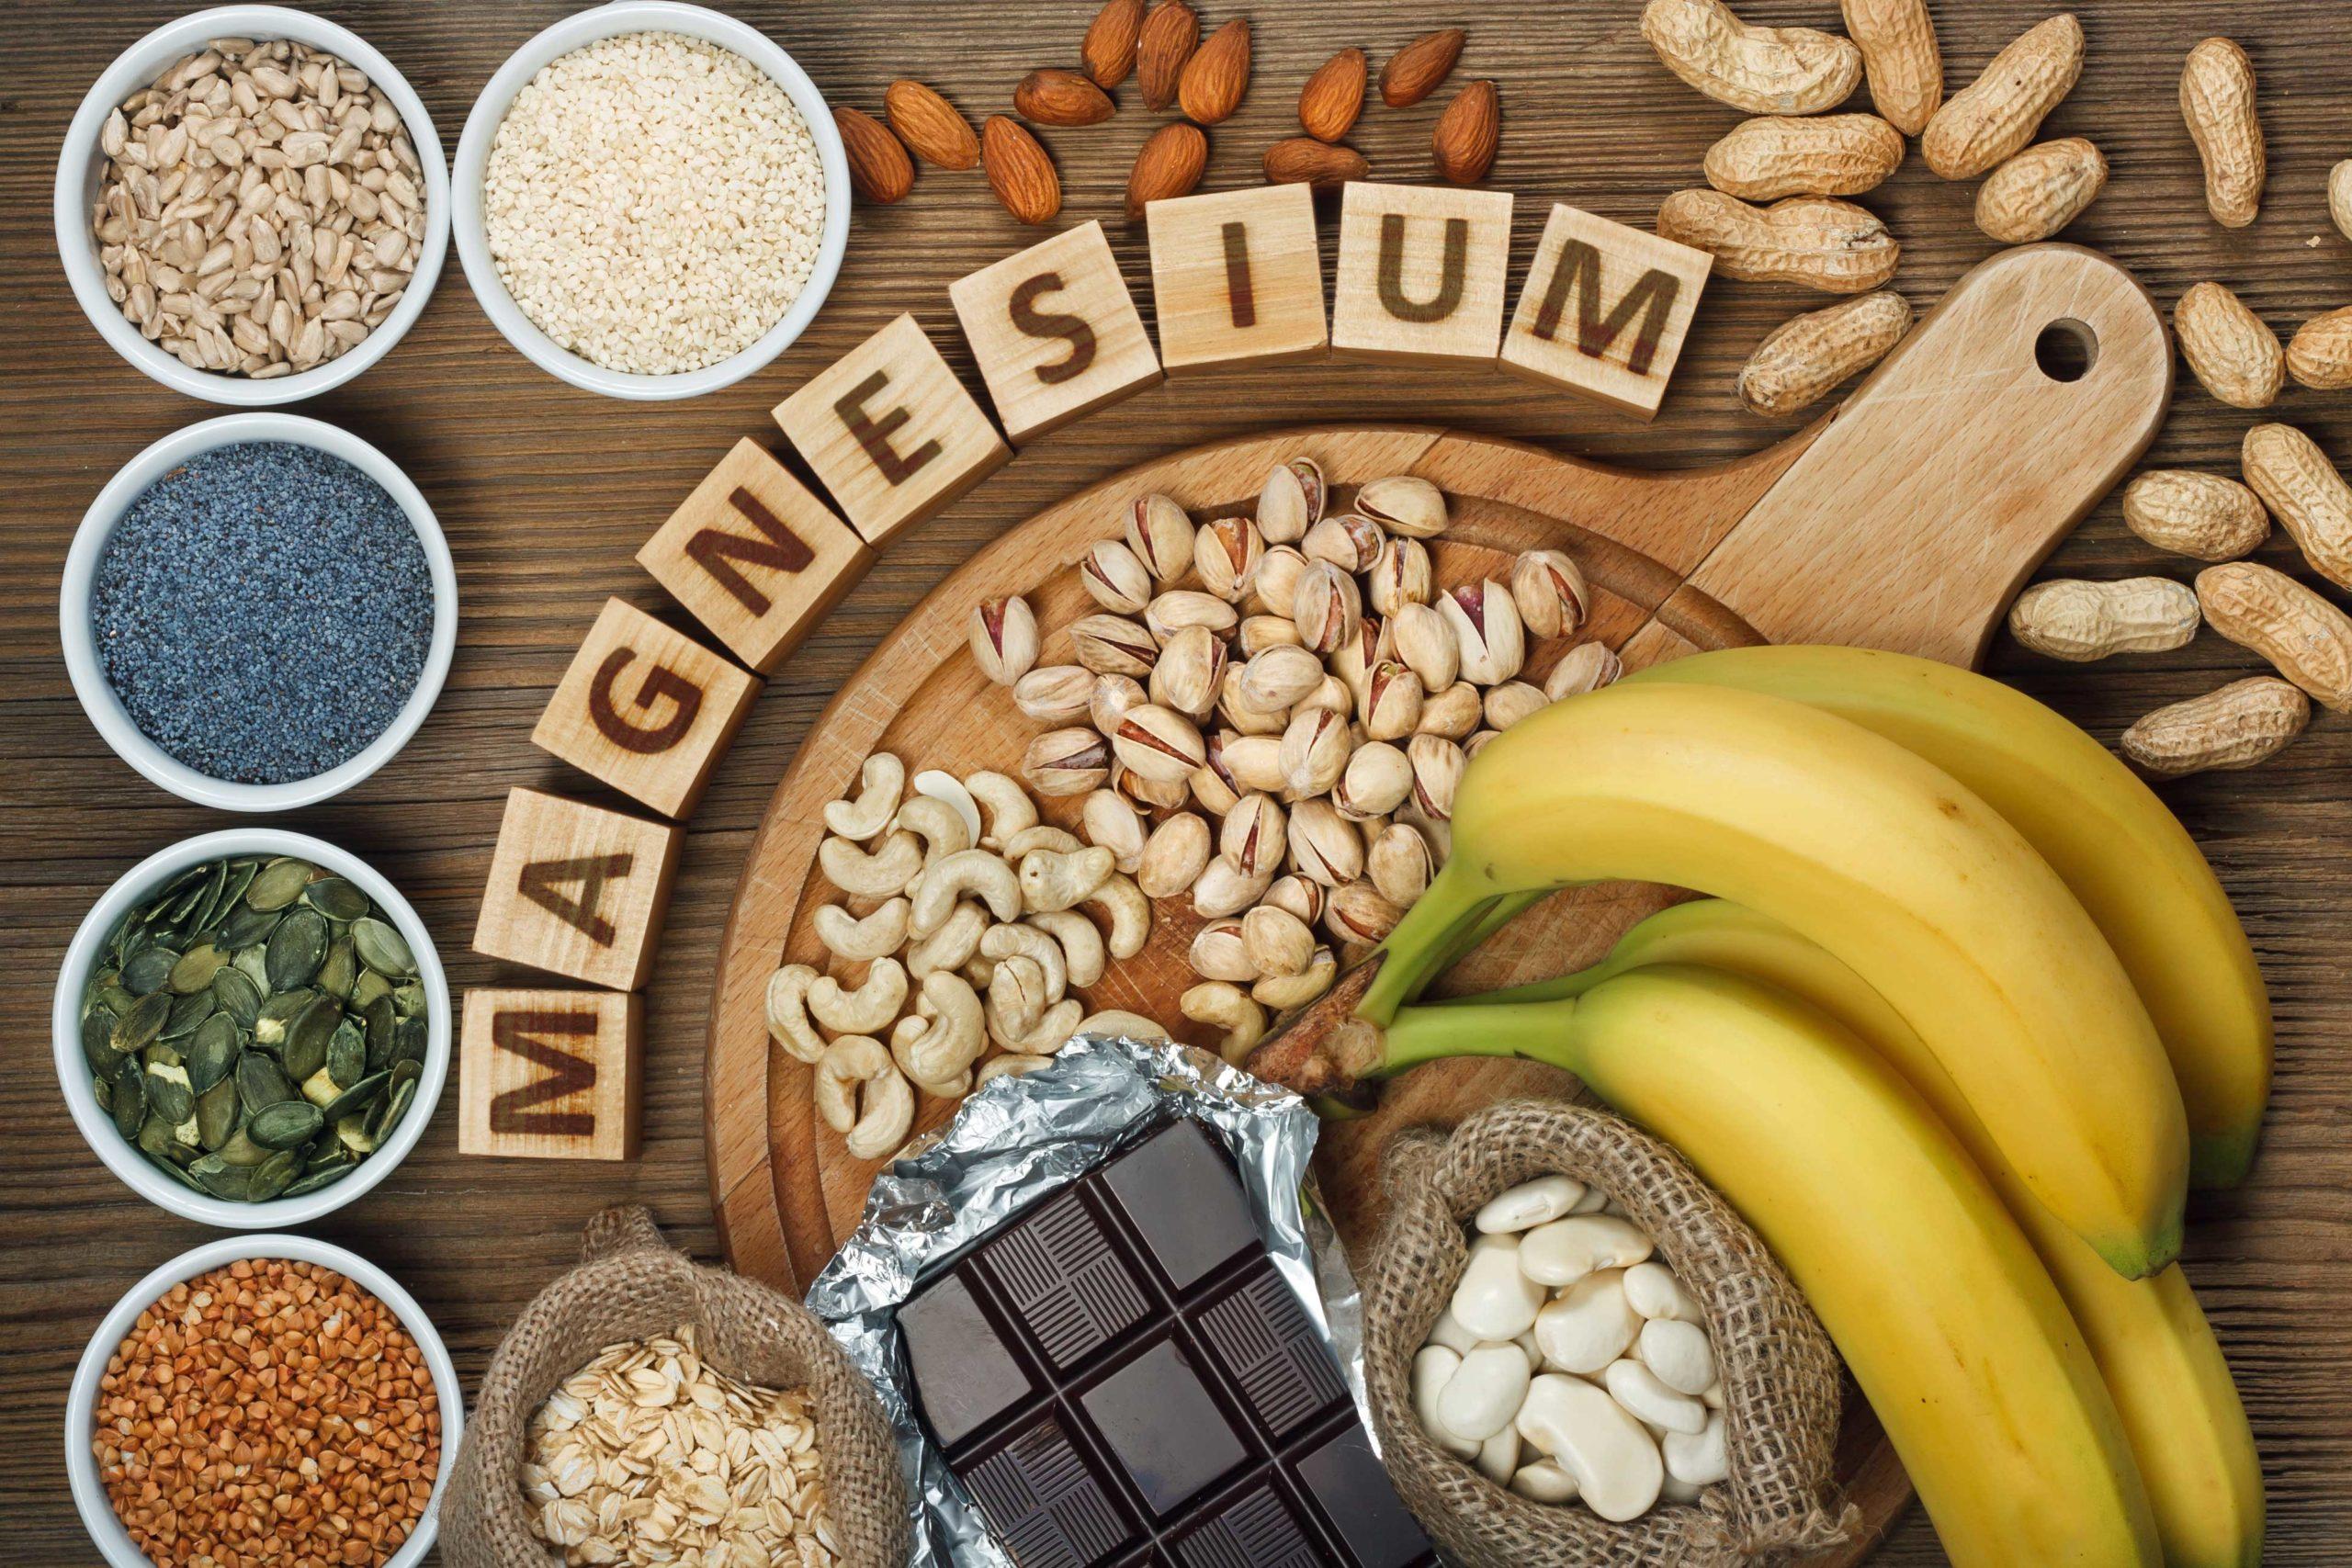 Increase Magnesium Intake